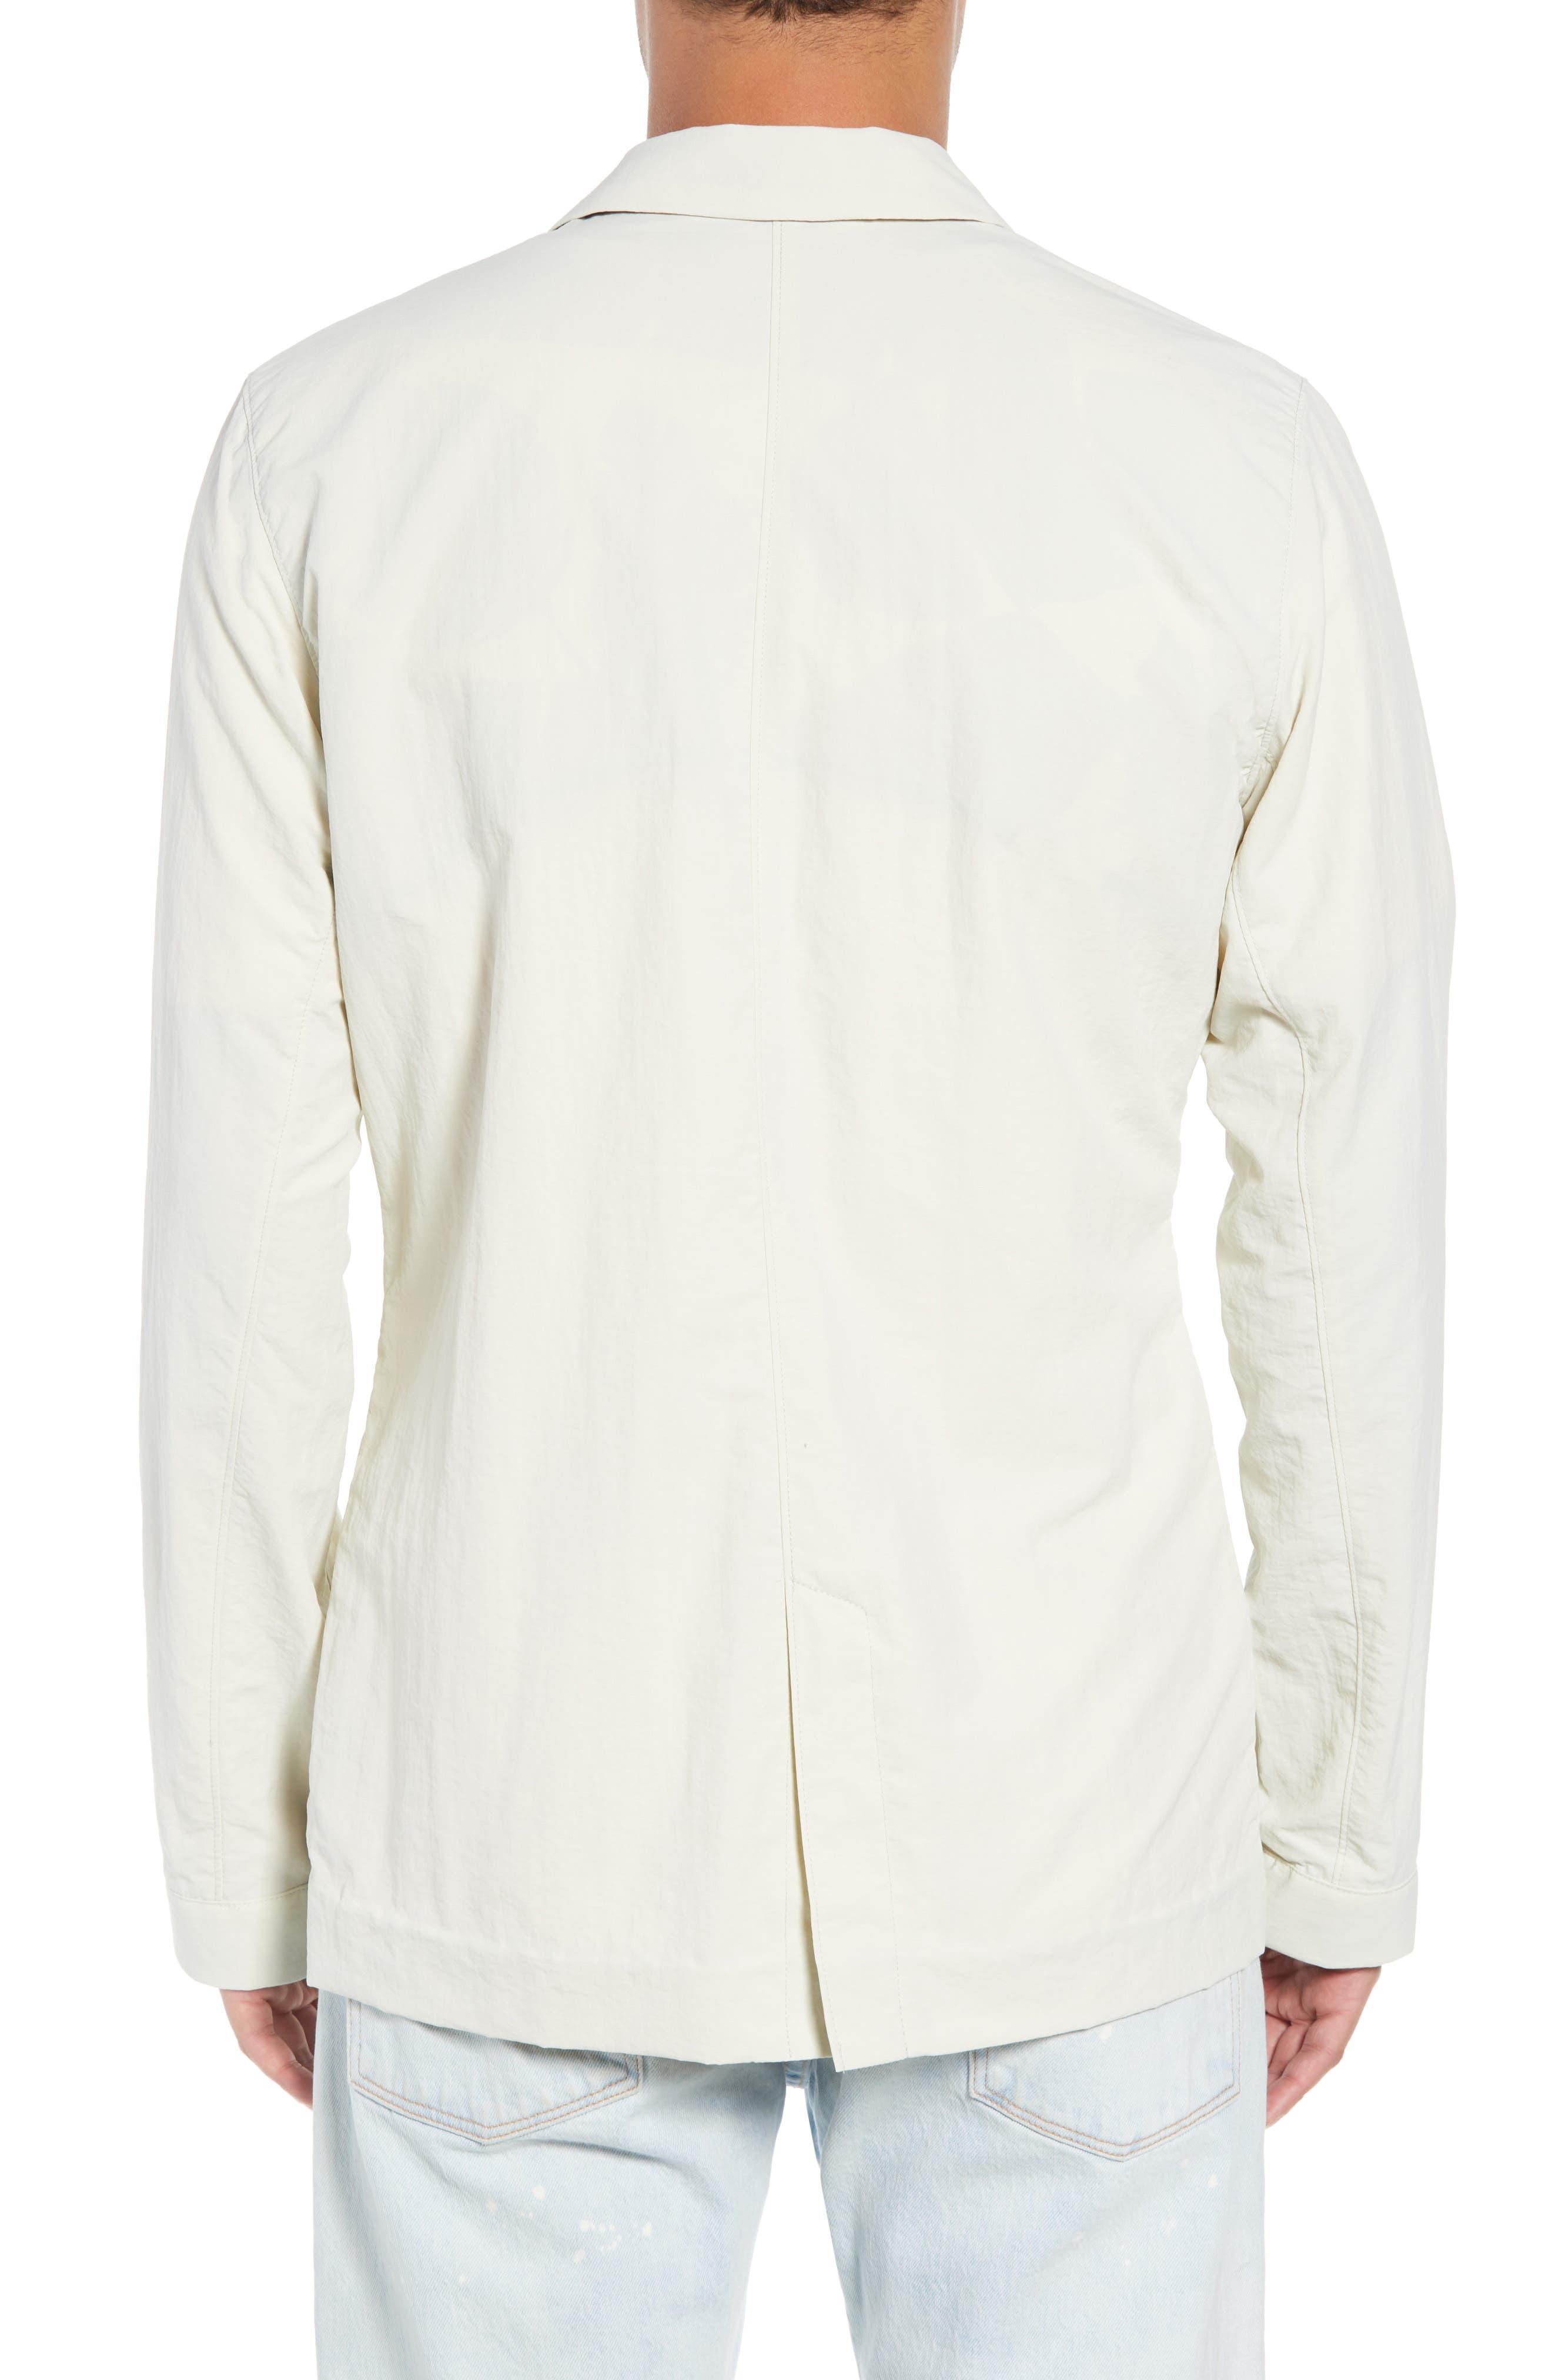 Wrinkled Chore Jacket,                             Alternate thumbnail 2, color,                             062